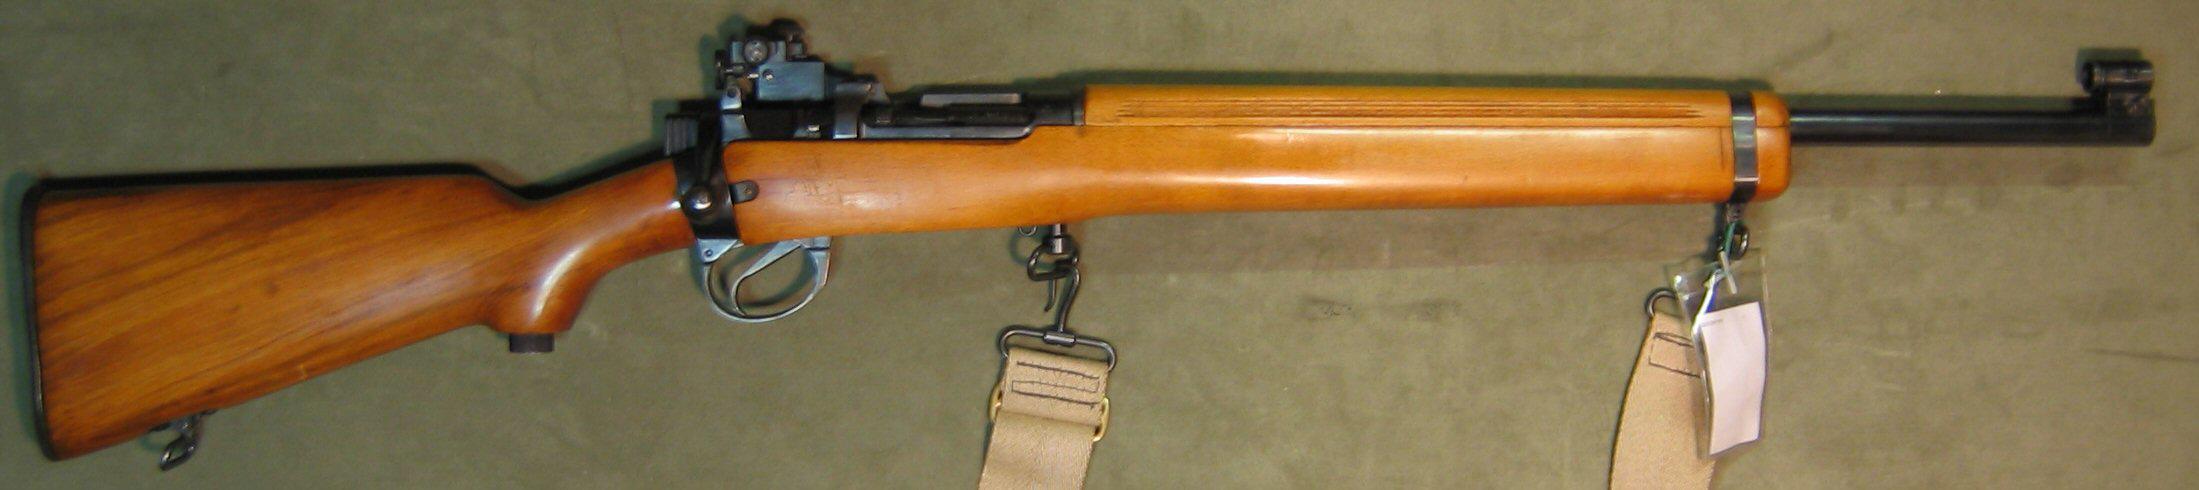 Lee-Enfield Rifle No 8